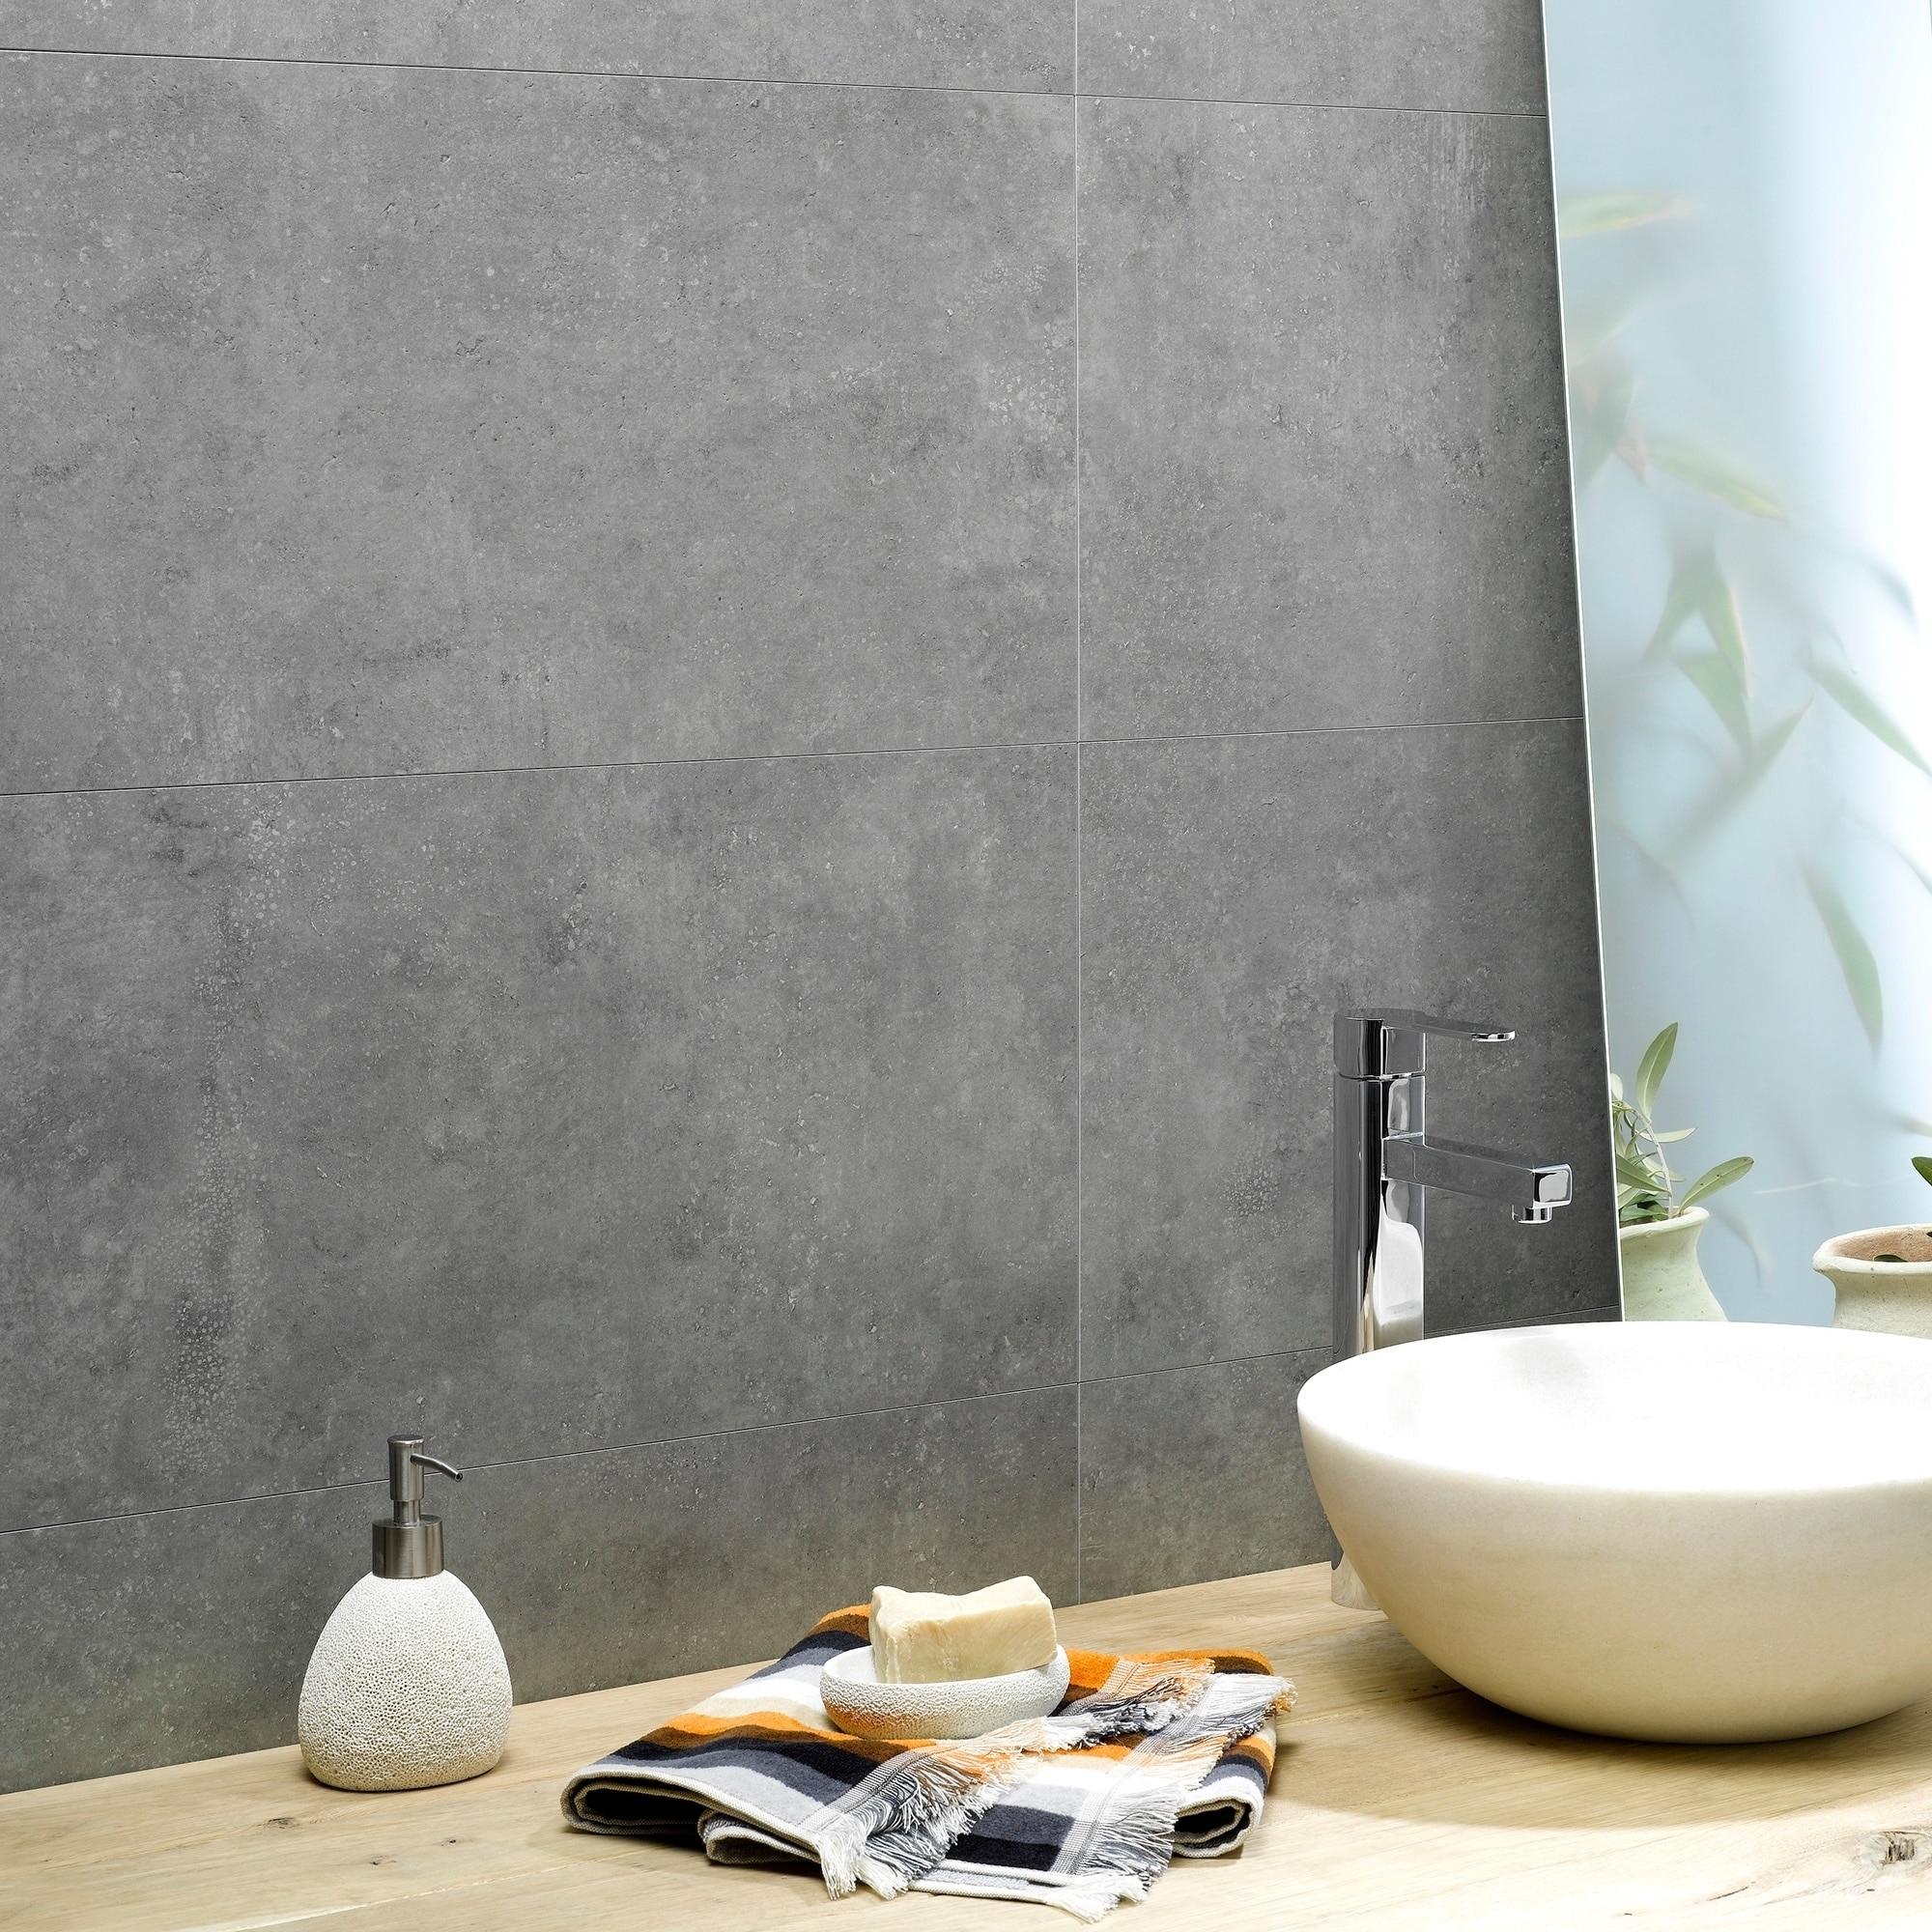 Dumawall 14 76 In X 25 59 In Vinyl Interlocking Waterproof Smoked Steel Wall Tile Backsplash 8 Pack Overstock 17795479